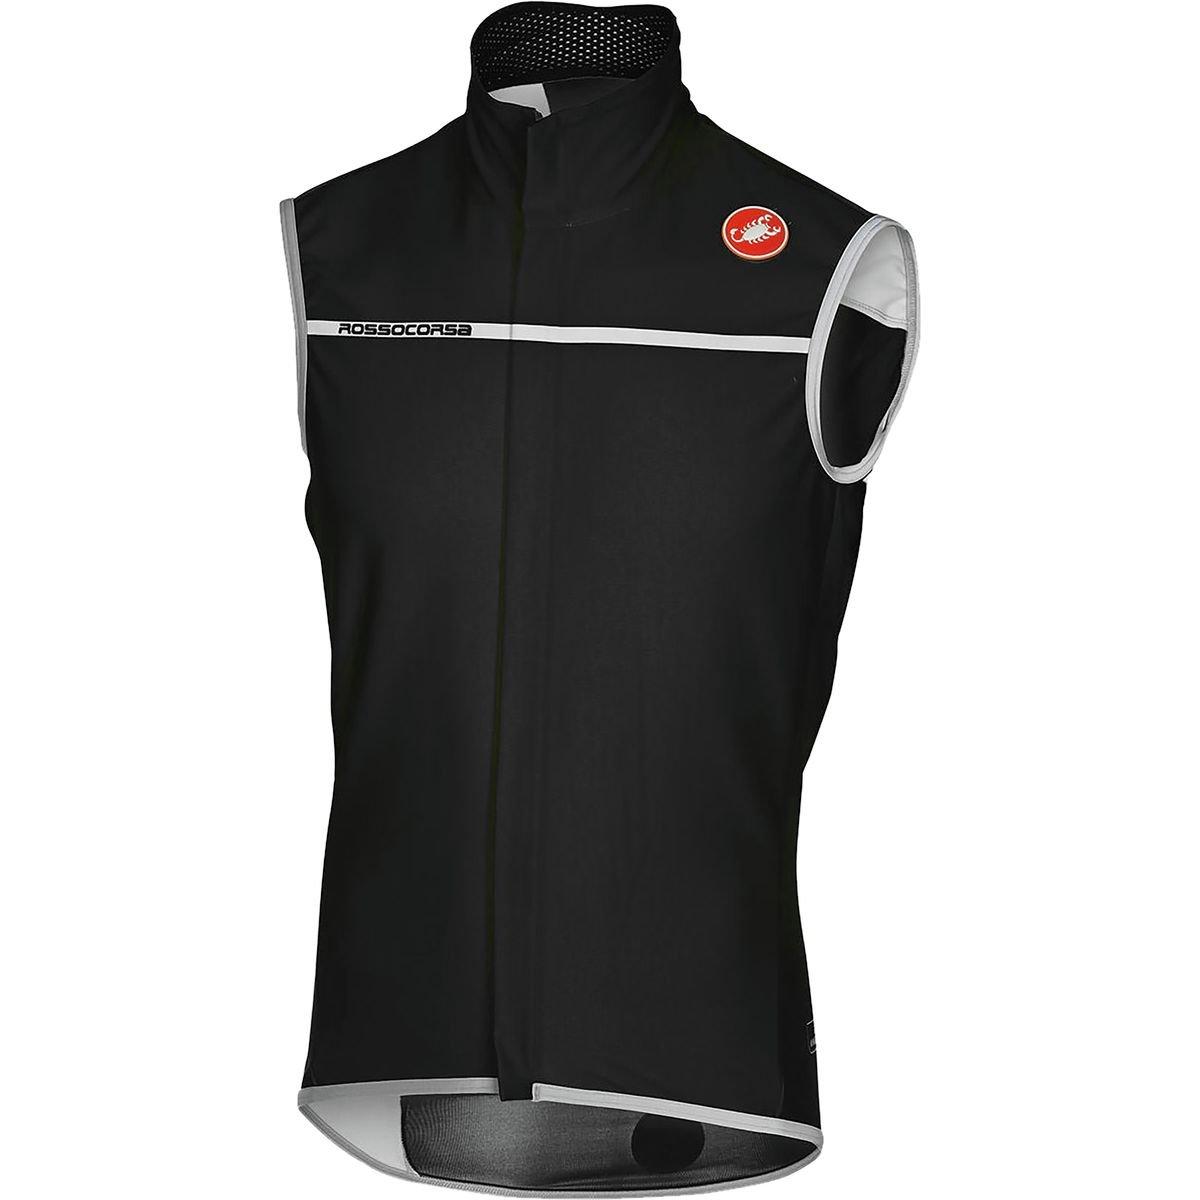 Castelli Perfetto Vest - Men's Light Black, XL by Castelli